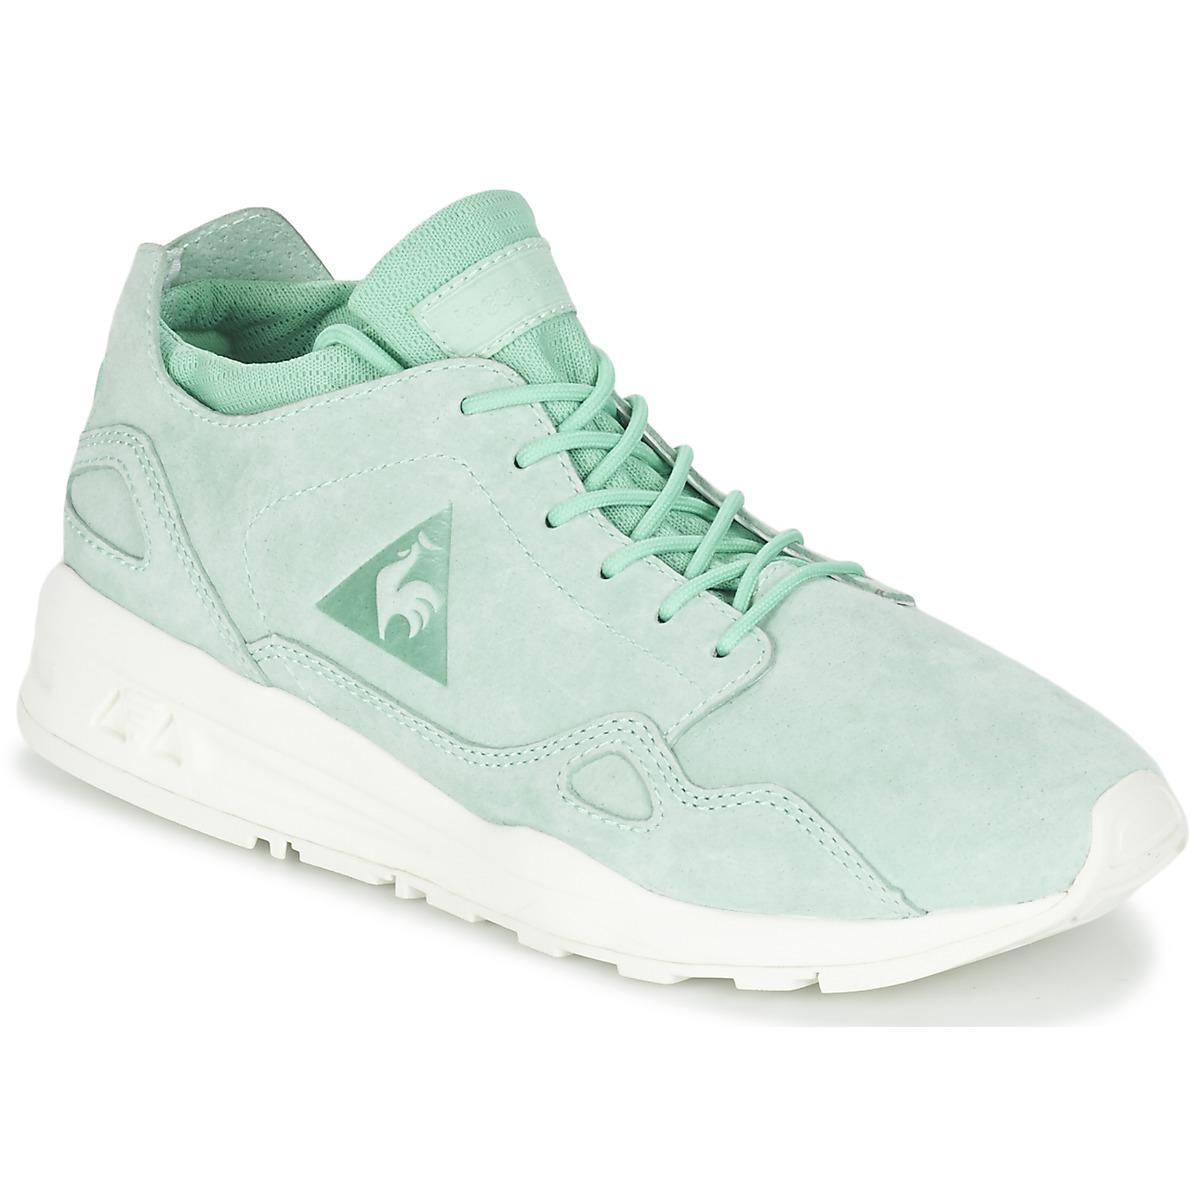 d3da63ab2595 Le Coq Sportif Lcs R Flow W Nubuck Shoes (trainers) in Green - Lyst ...